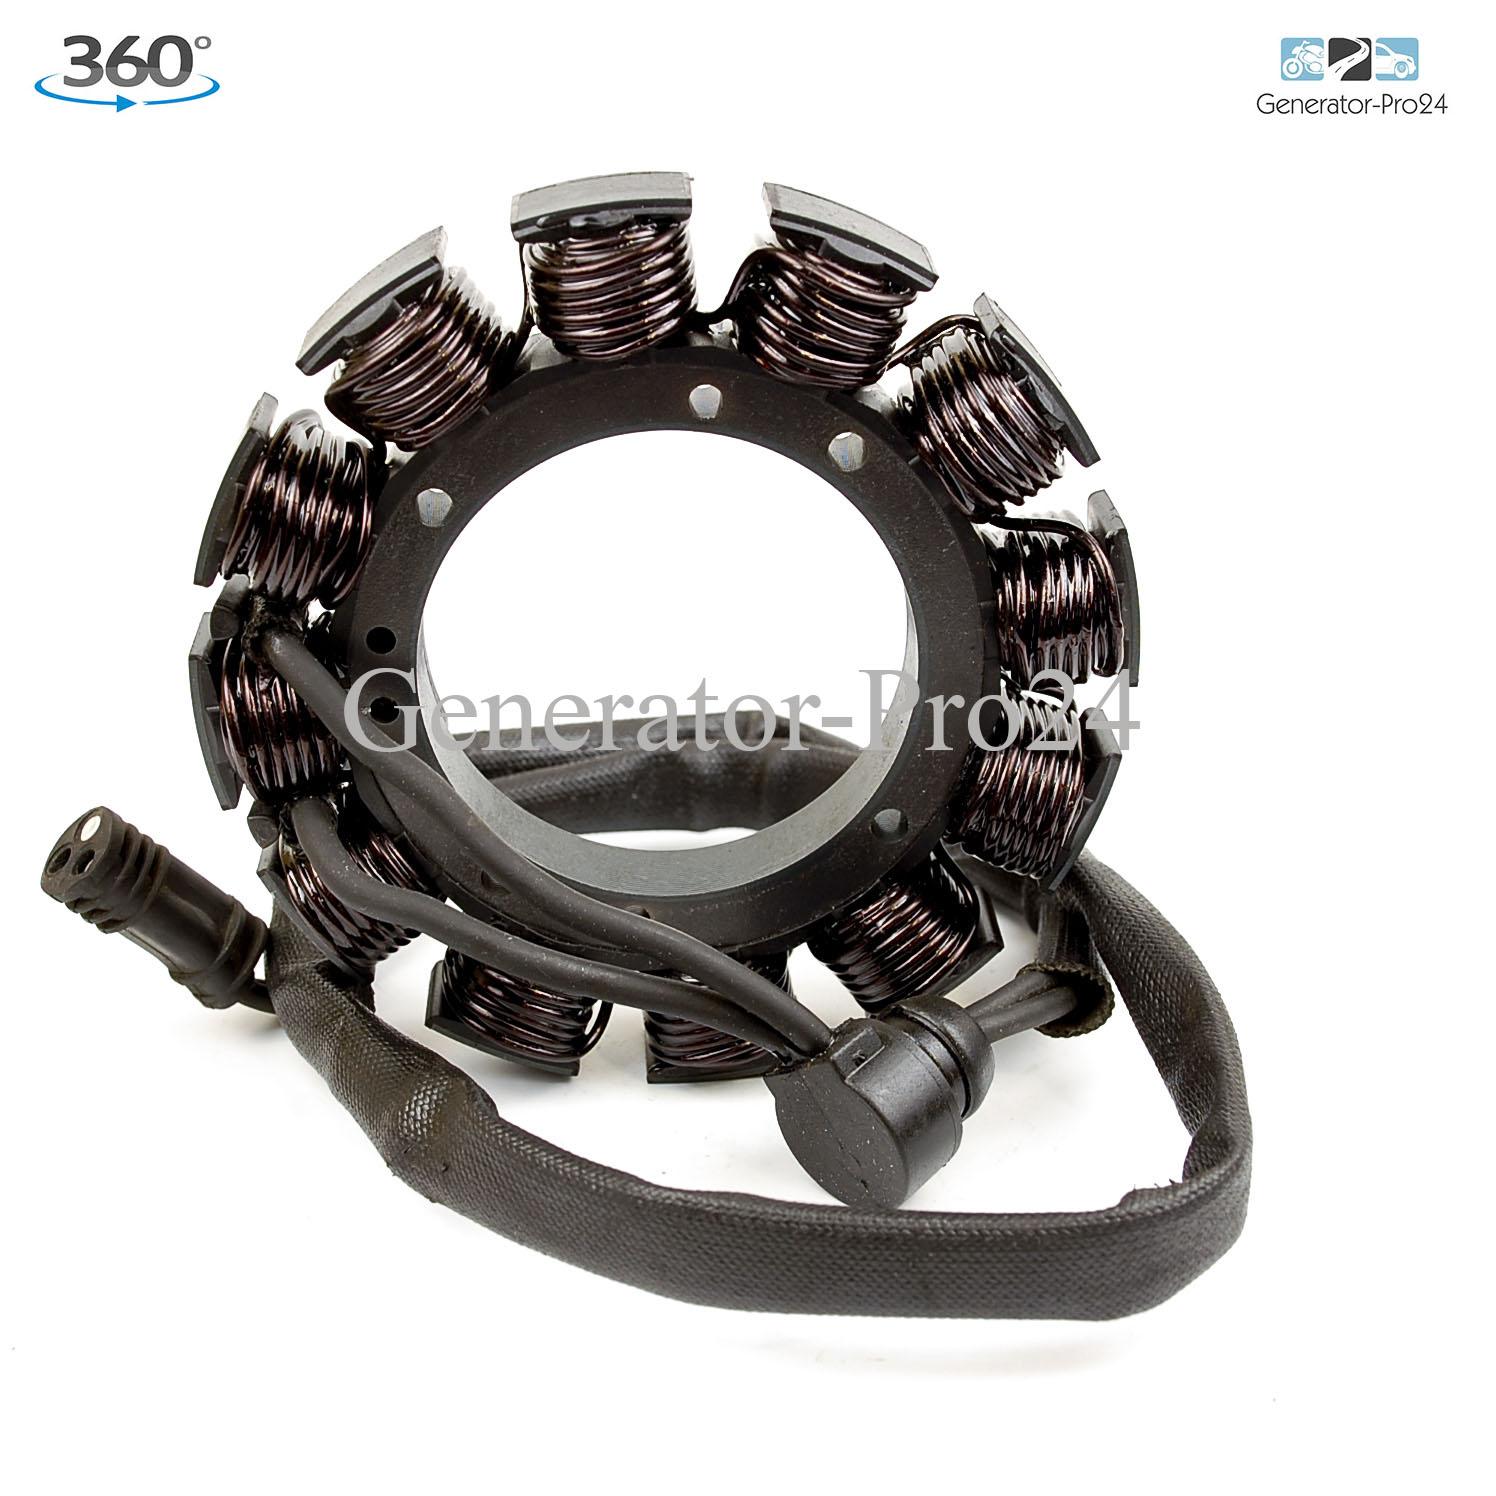 HARLEY-DAVIDSON Stator Plate OEM29900026 | Generator-Pro24